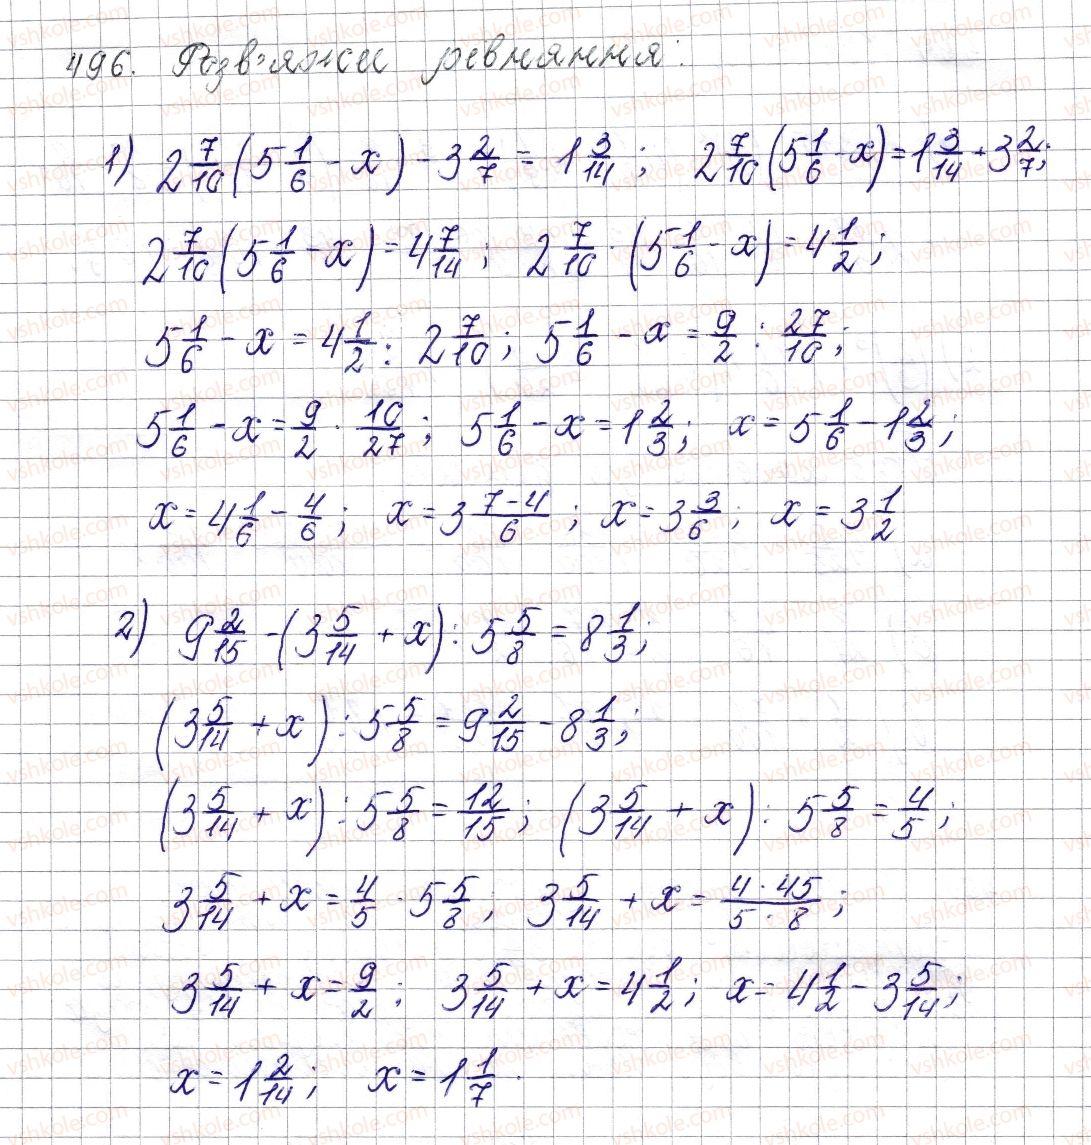 6-matematika-os-ister-2014--rozdil-2-zvichajni-drobi-19-rozvyazuvannya-vprav-na-vsi-diyi-zi-zvichajnimi-ta-desyatkovimi-drobami-496-rnd9317.jpg